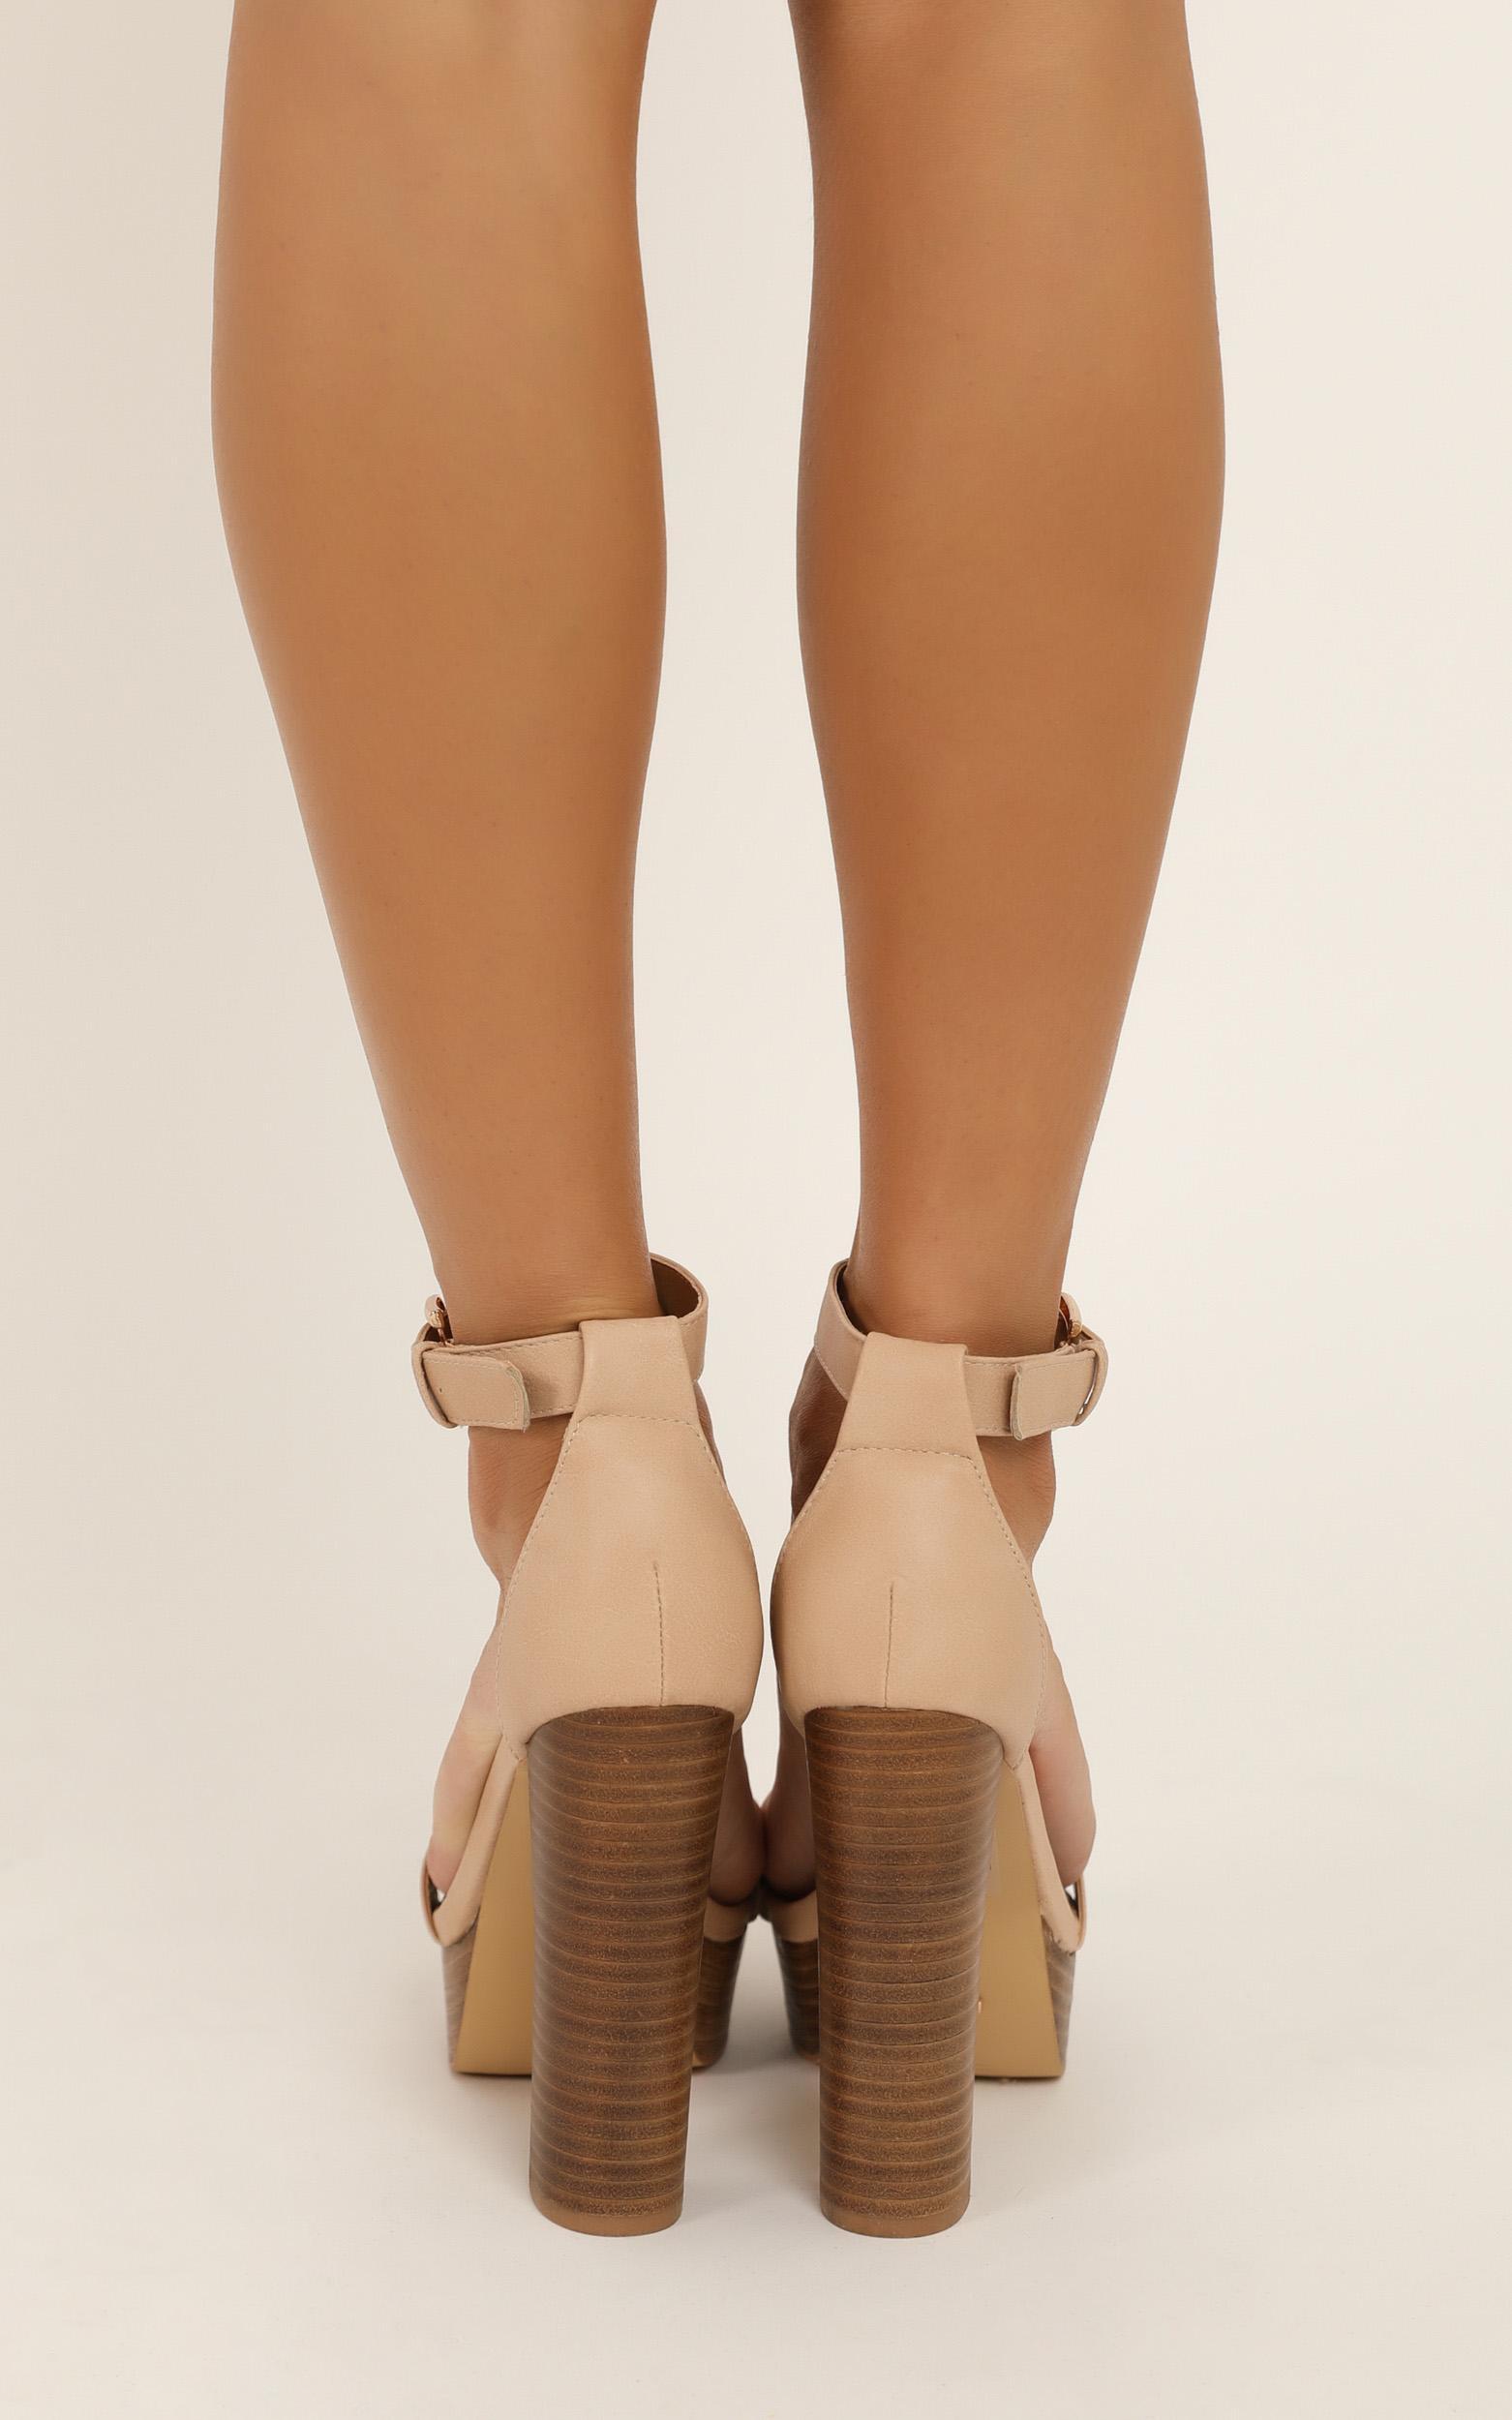 Billini - Egypt heels in nude - 10, Beige, hi-res image number null